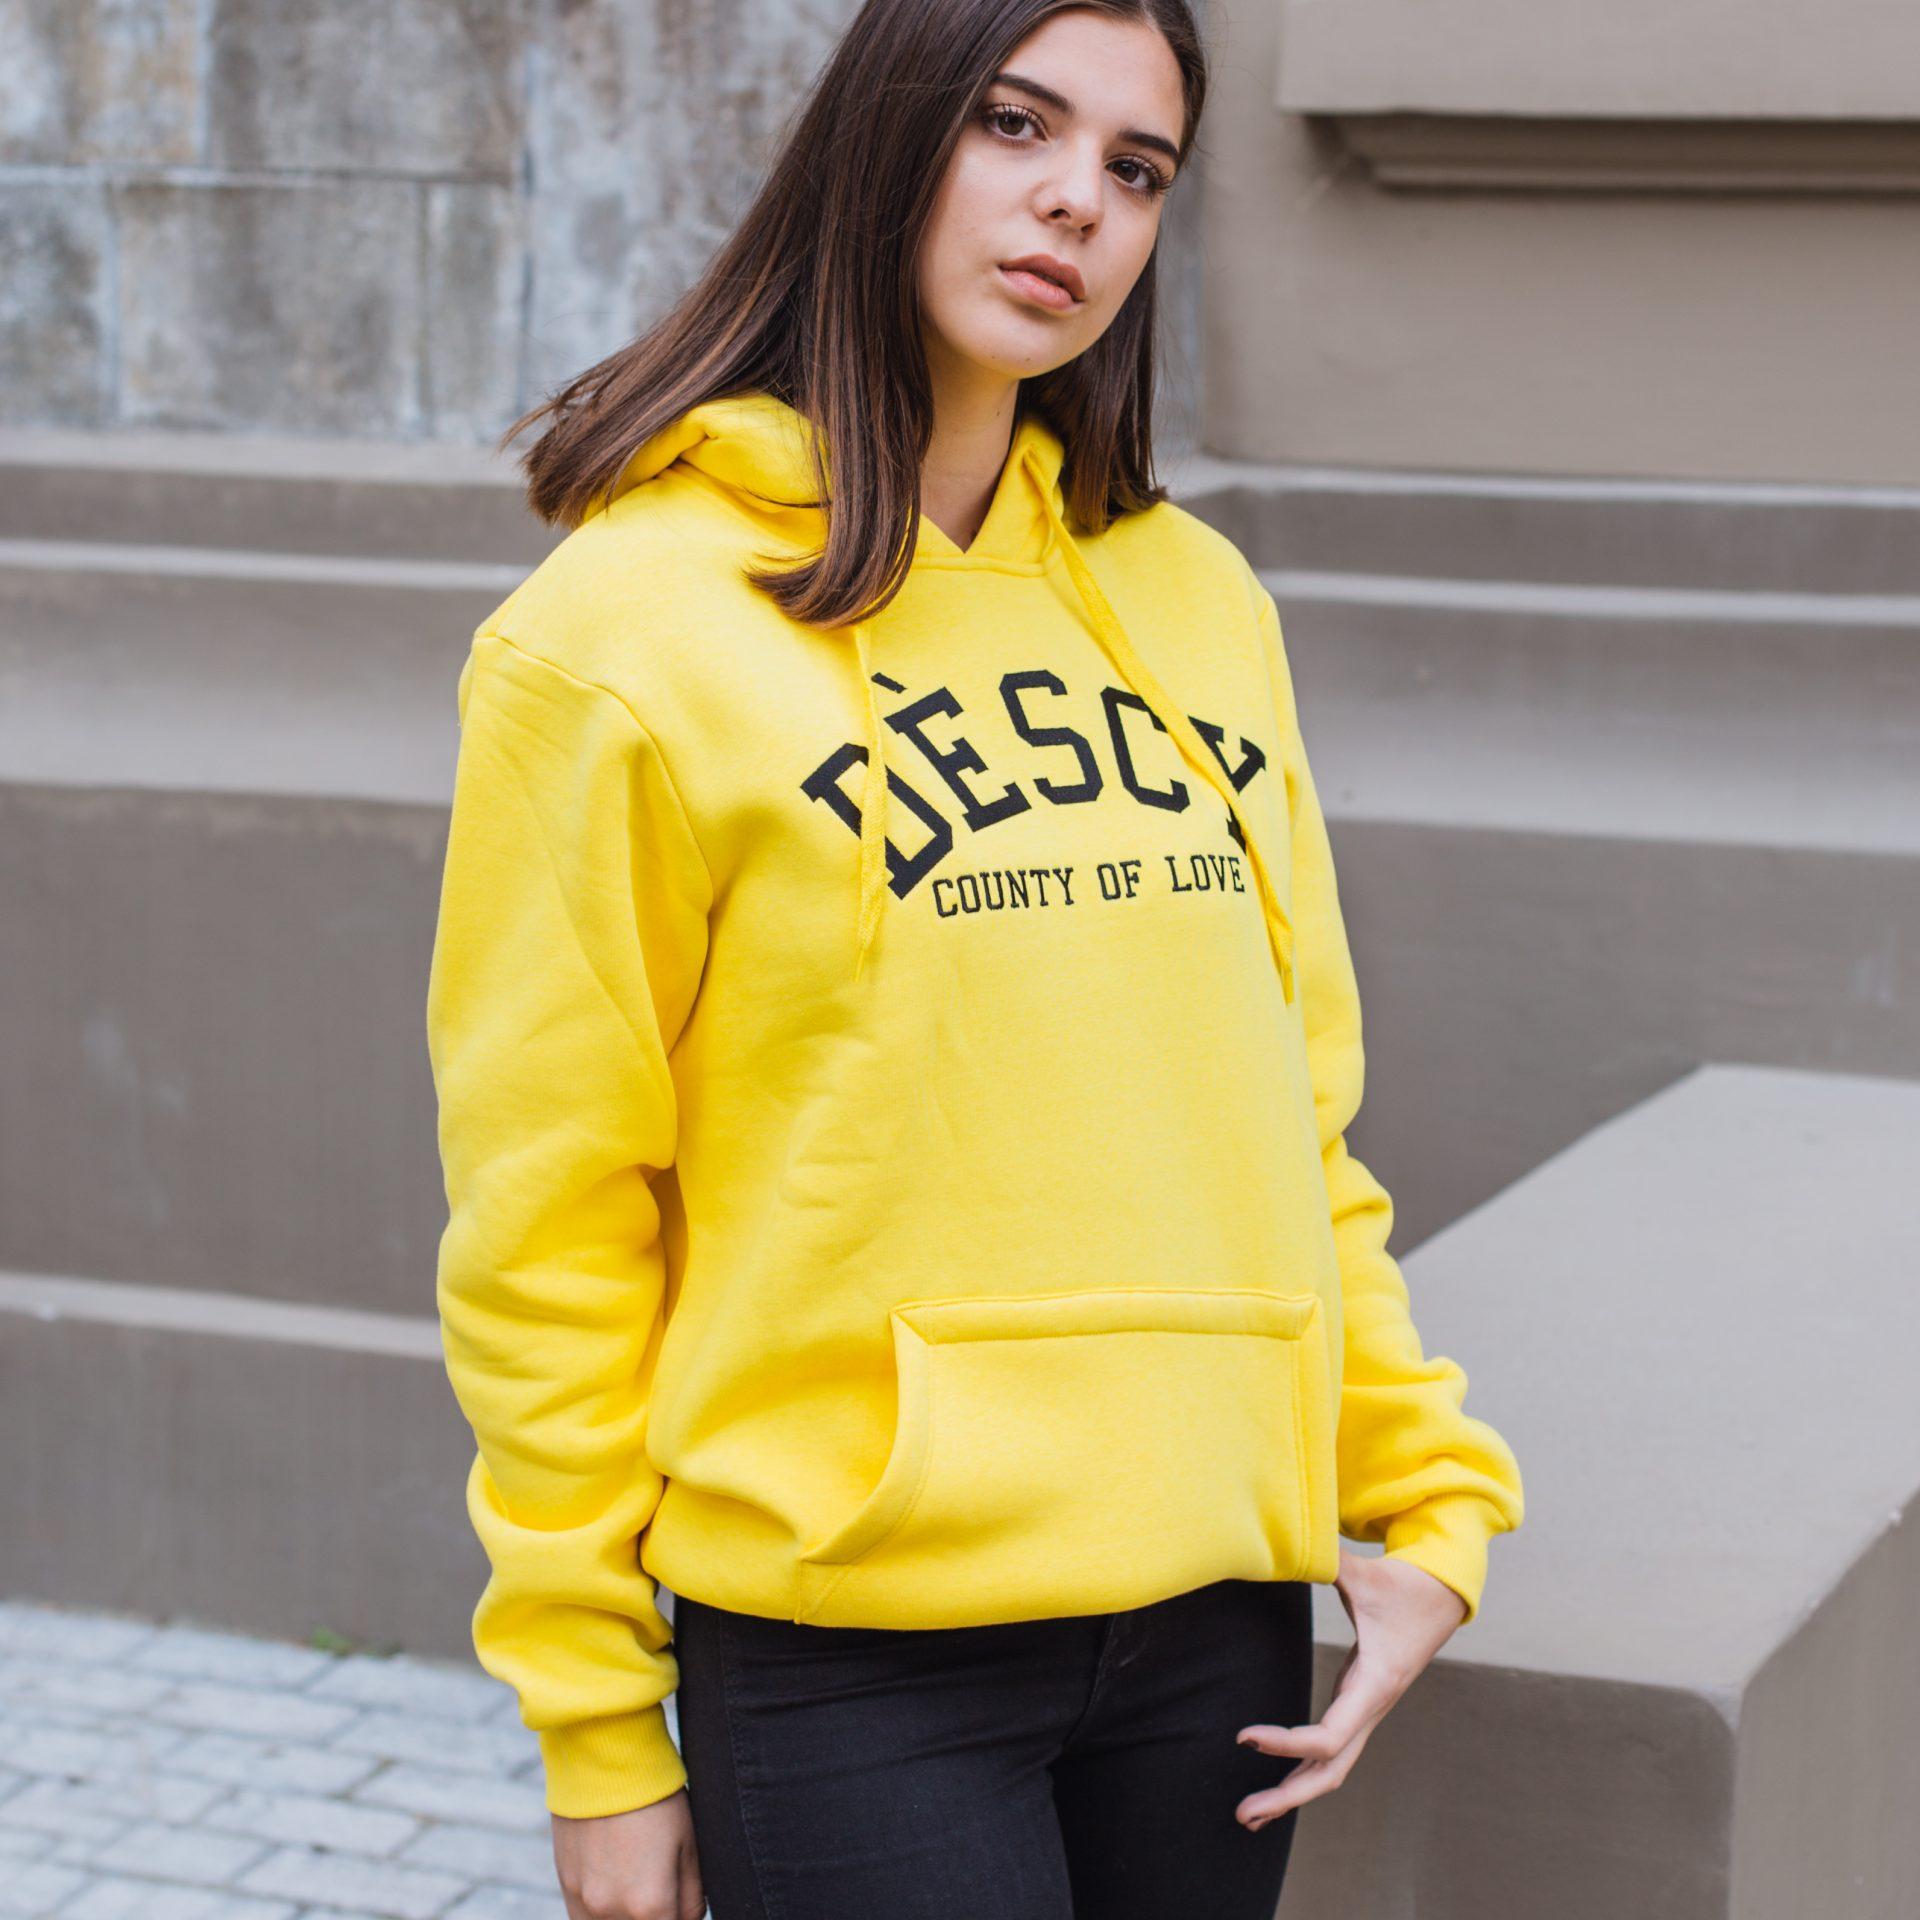 County Of Love Hoodie Yellow Unisex